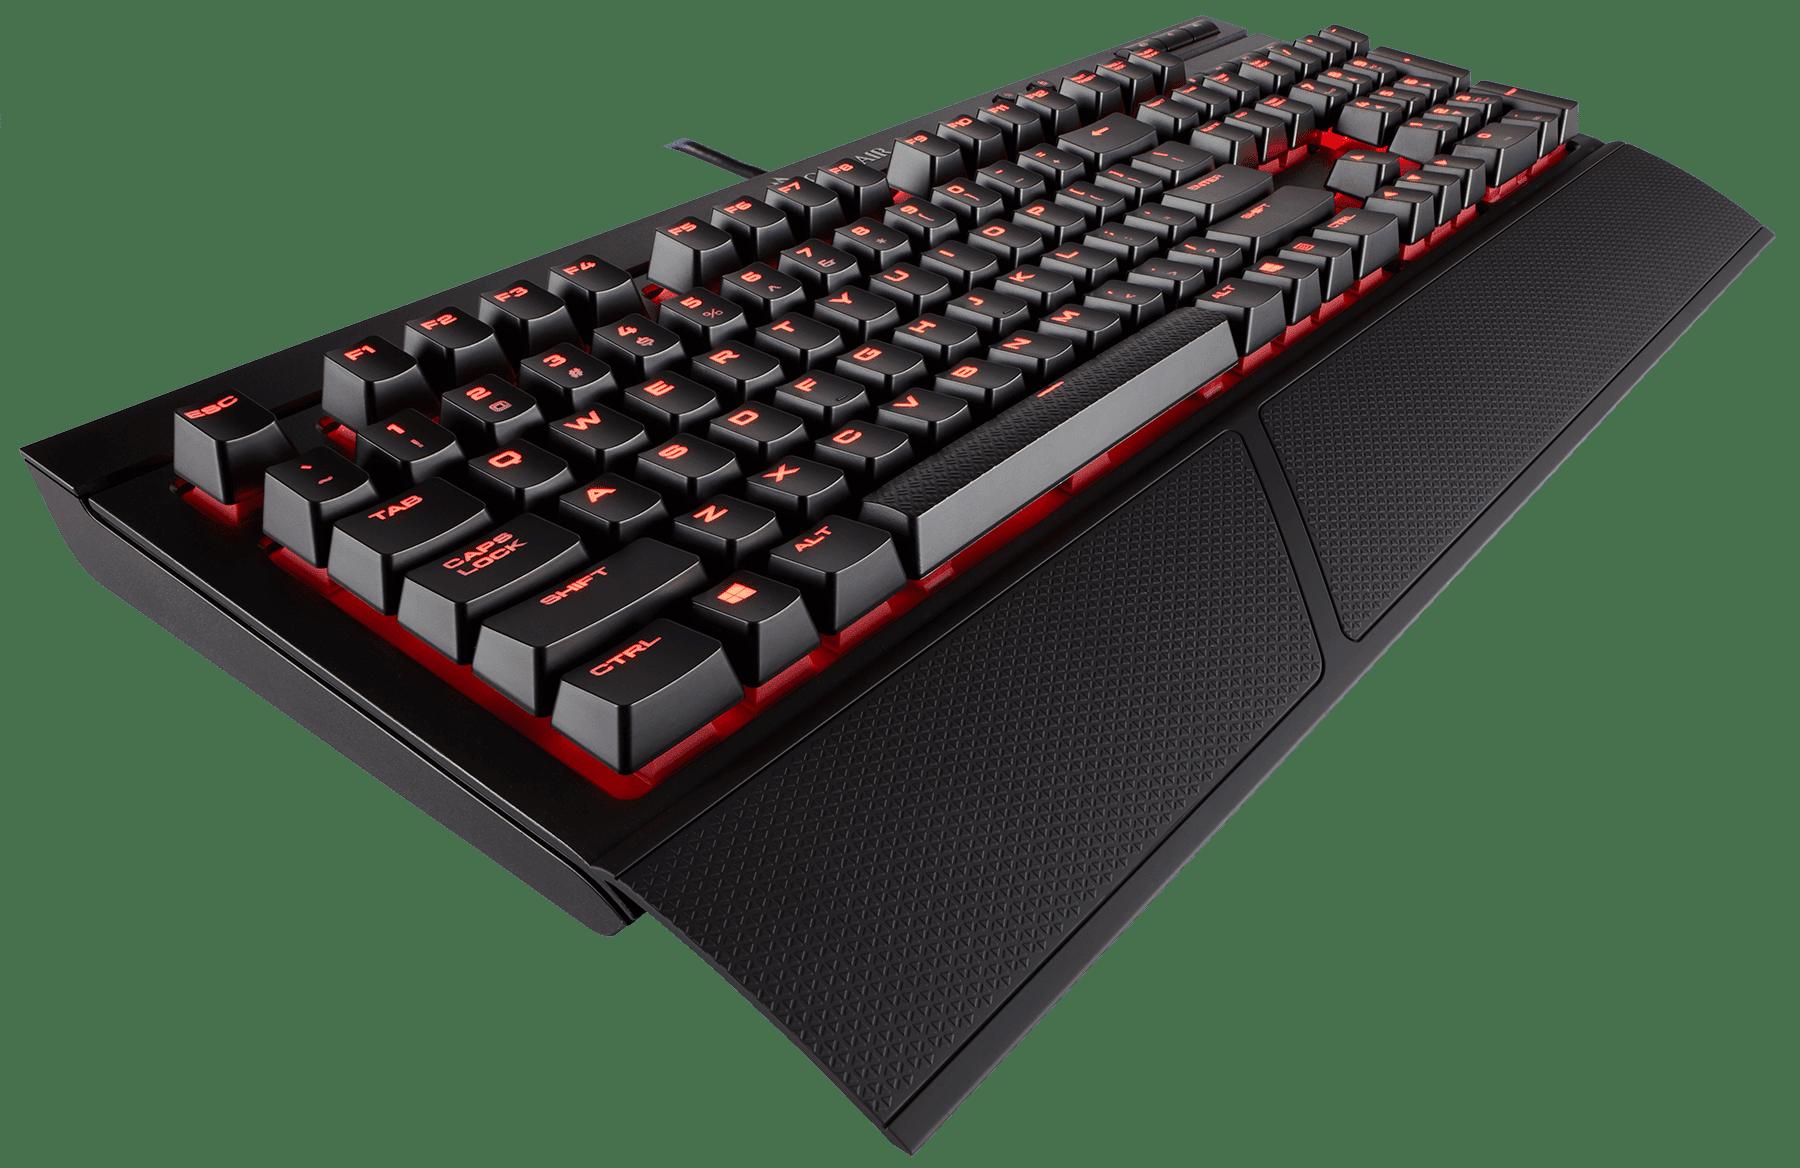 Corsair Gaming K68 Mechanical Keyboard, Backlit Red LED, Cherry MX Red - Walmart.com - Walmart.com